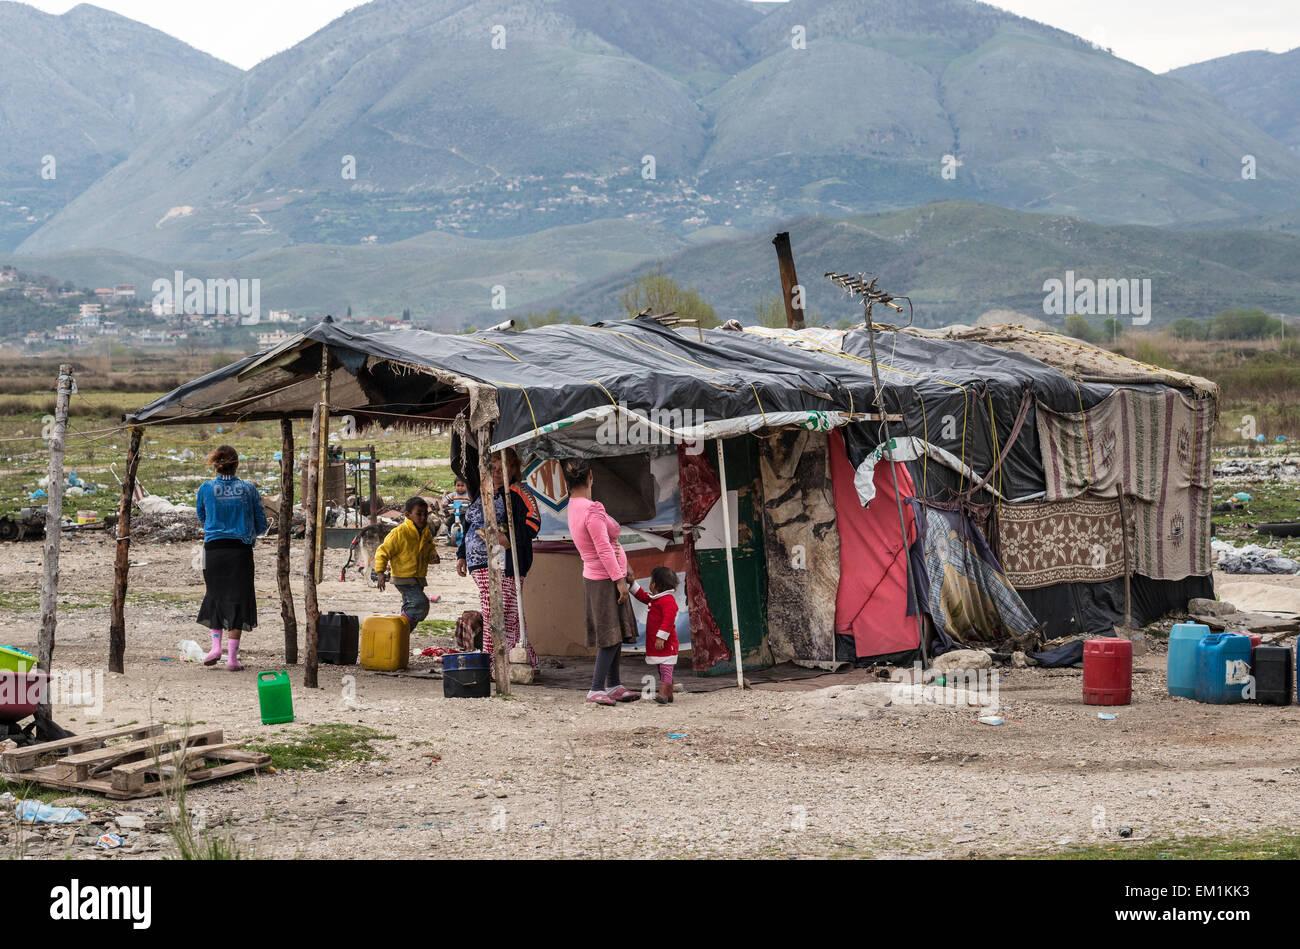 Roma Gypsy encampment near Saranda in Southern Albania. - Stock Image